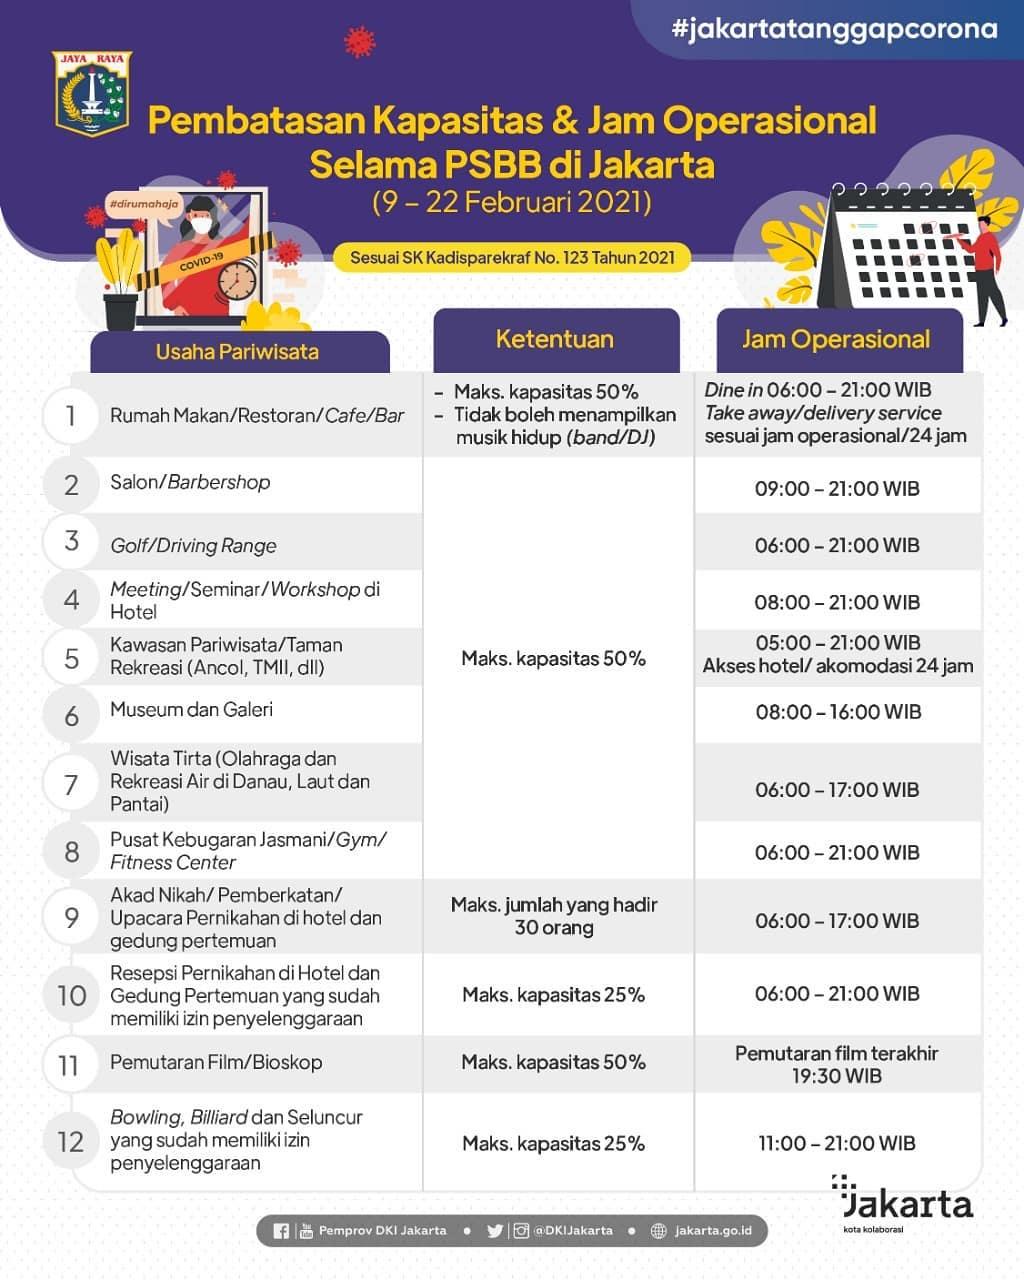 Kabijakan Transportasi PSBB 9 - 22 Feb